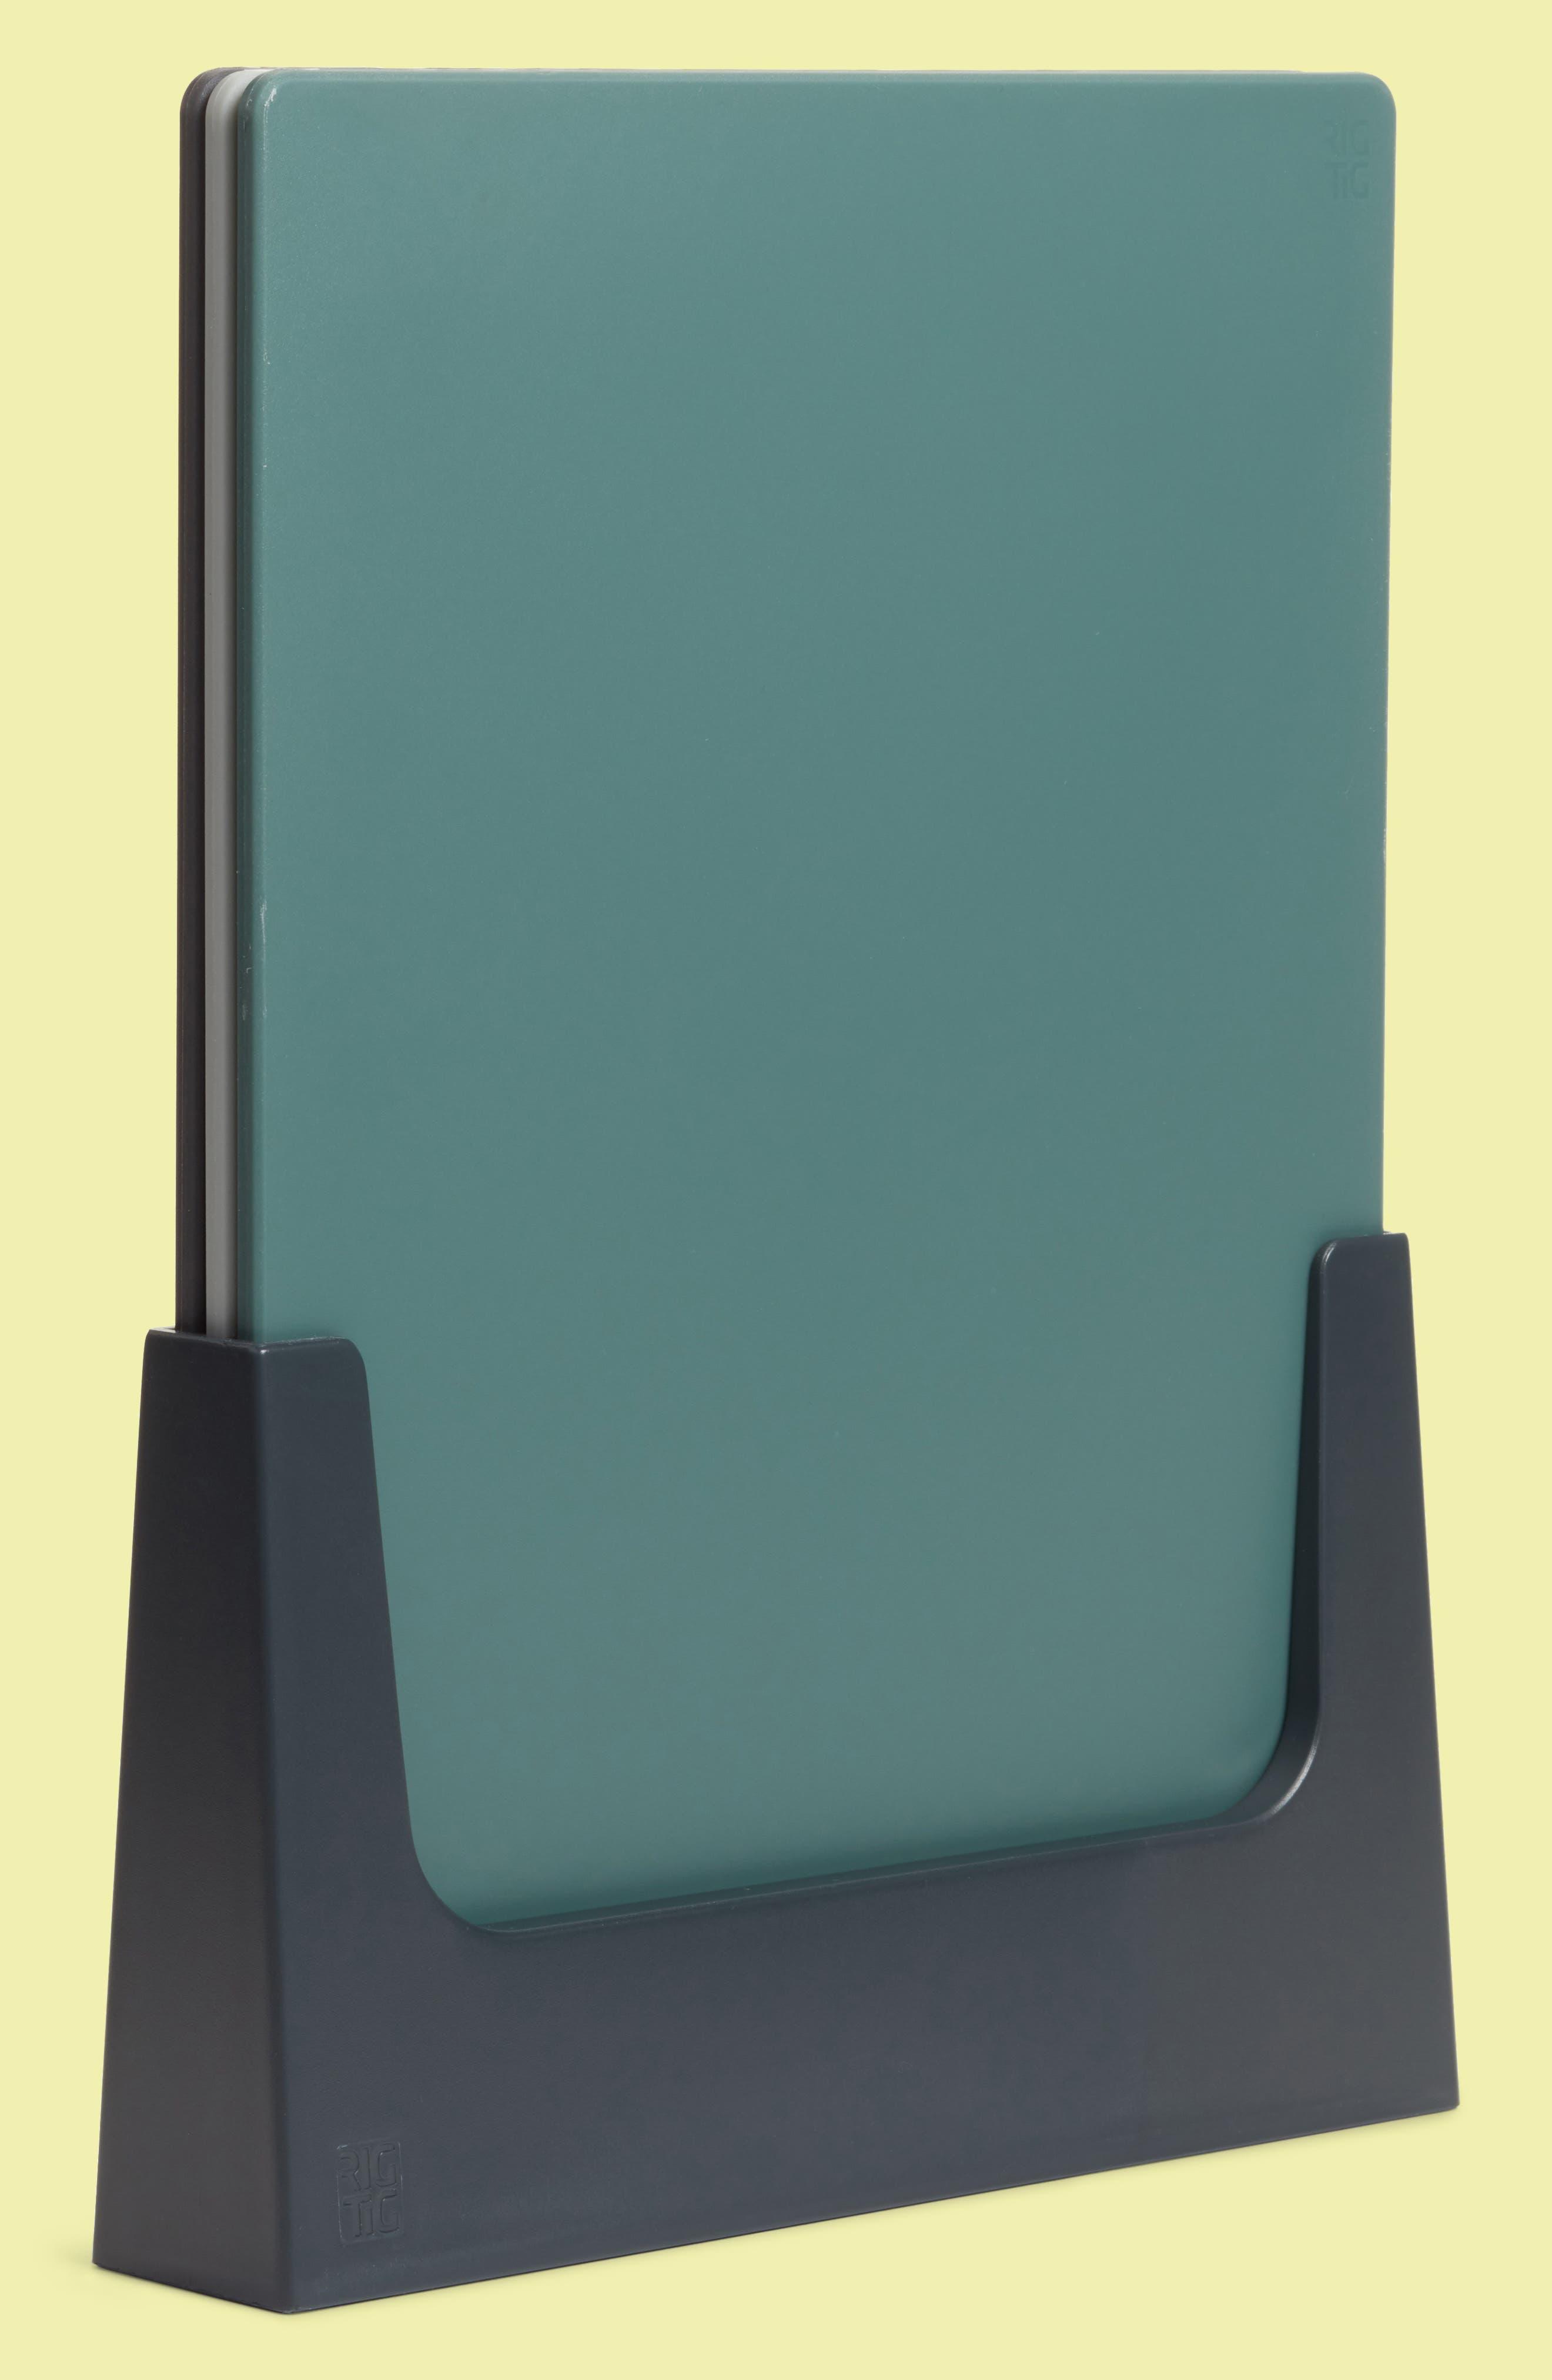 Rig-Tig Chop-It Set of 3 Cutting Boards,                             Main thumbnail 1, color,                             440